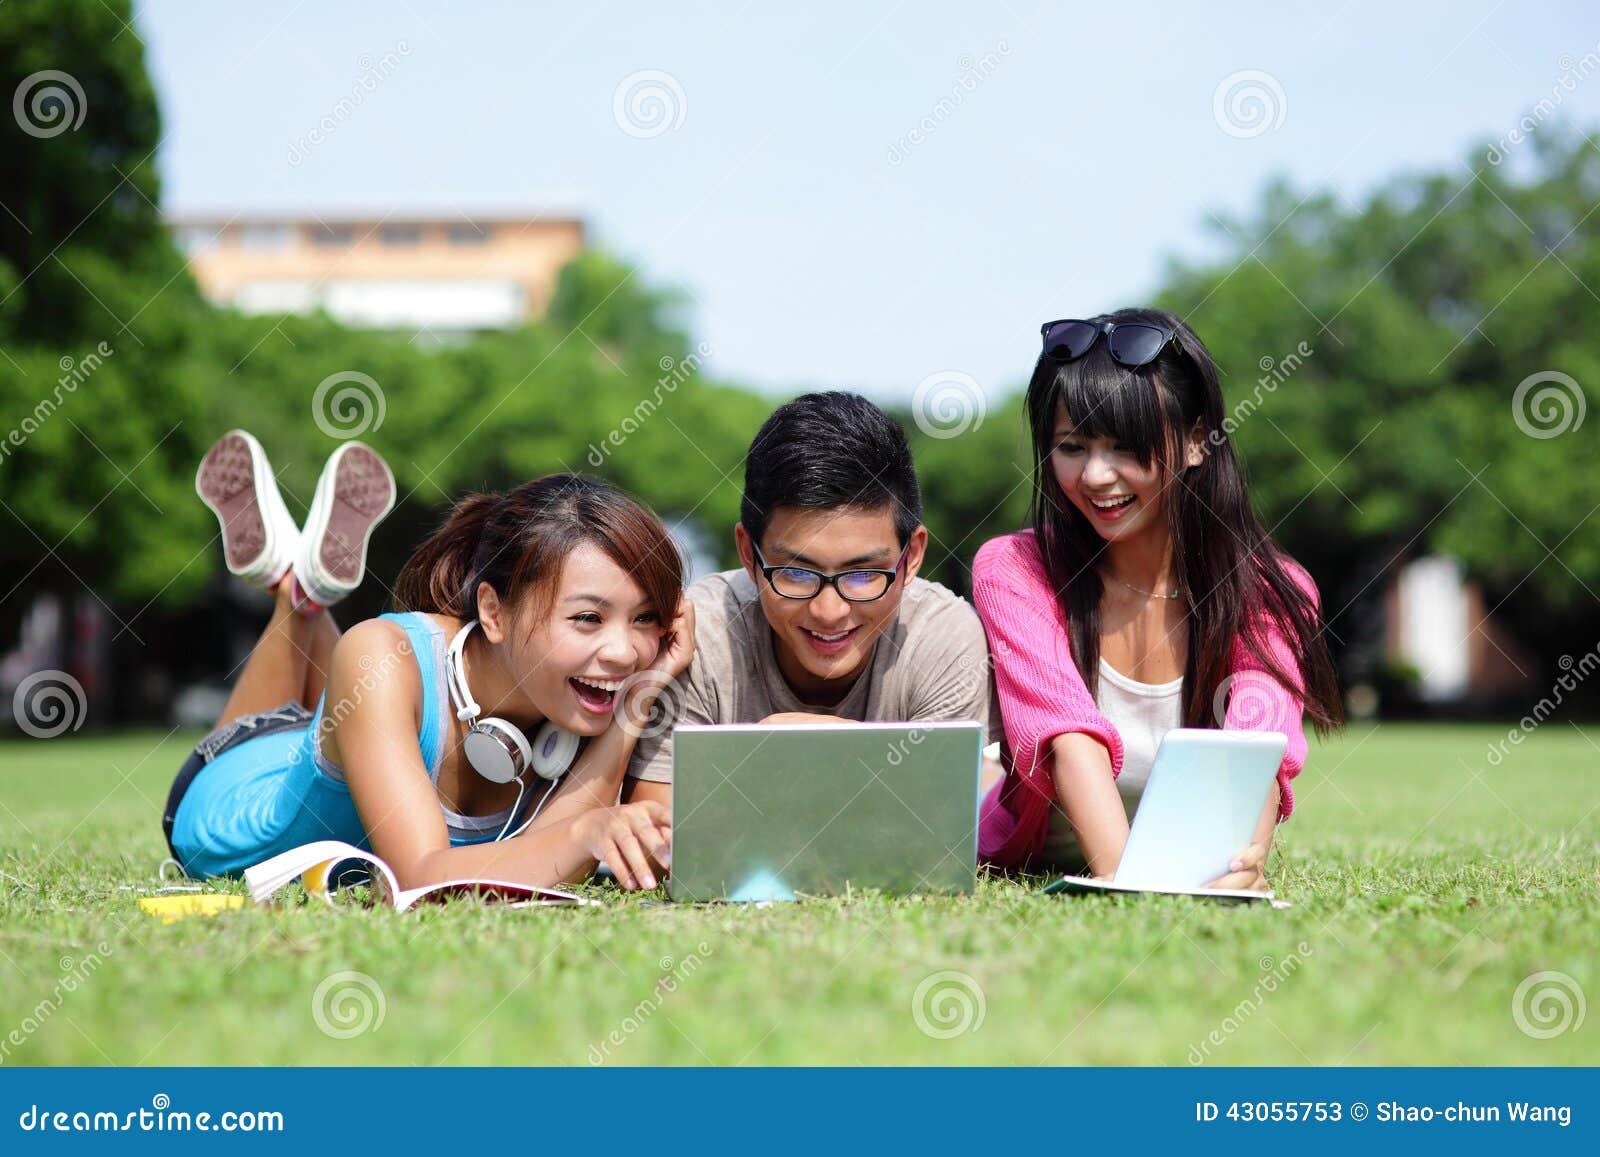 University Campus Clipart